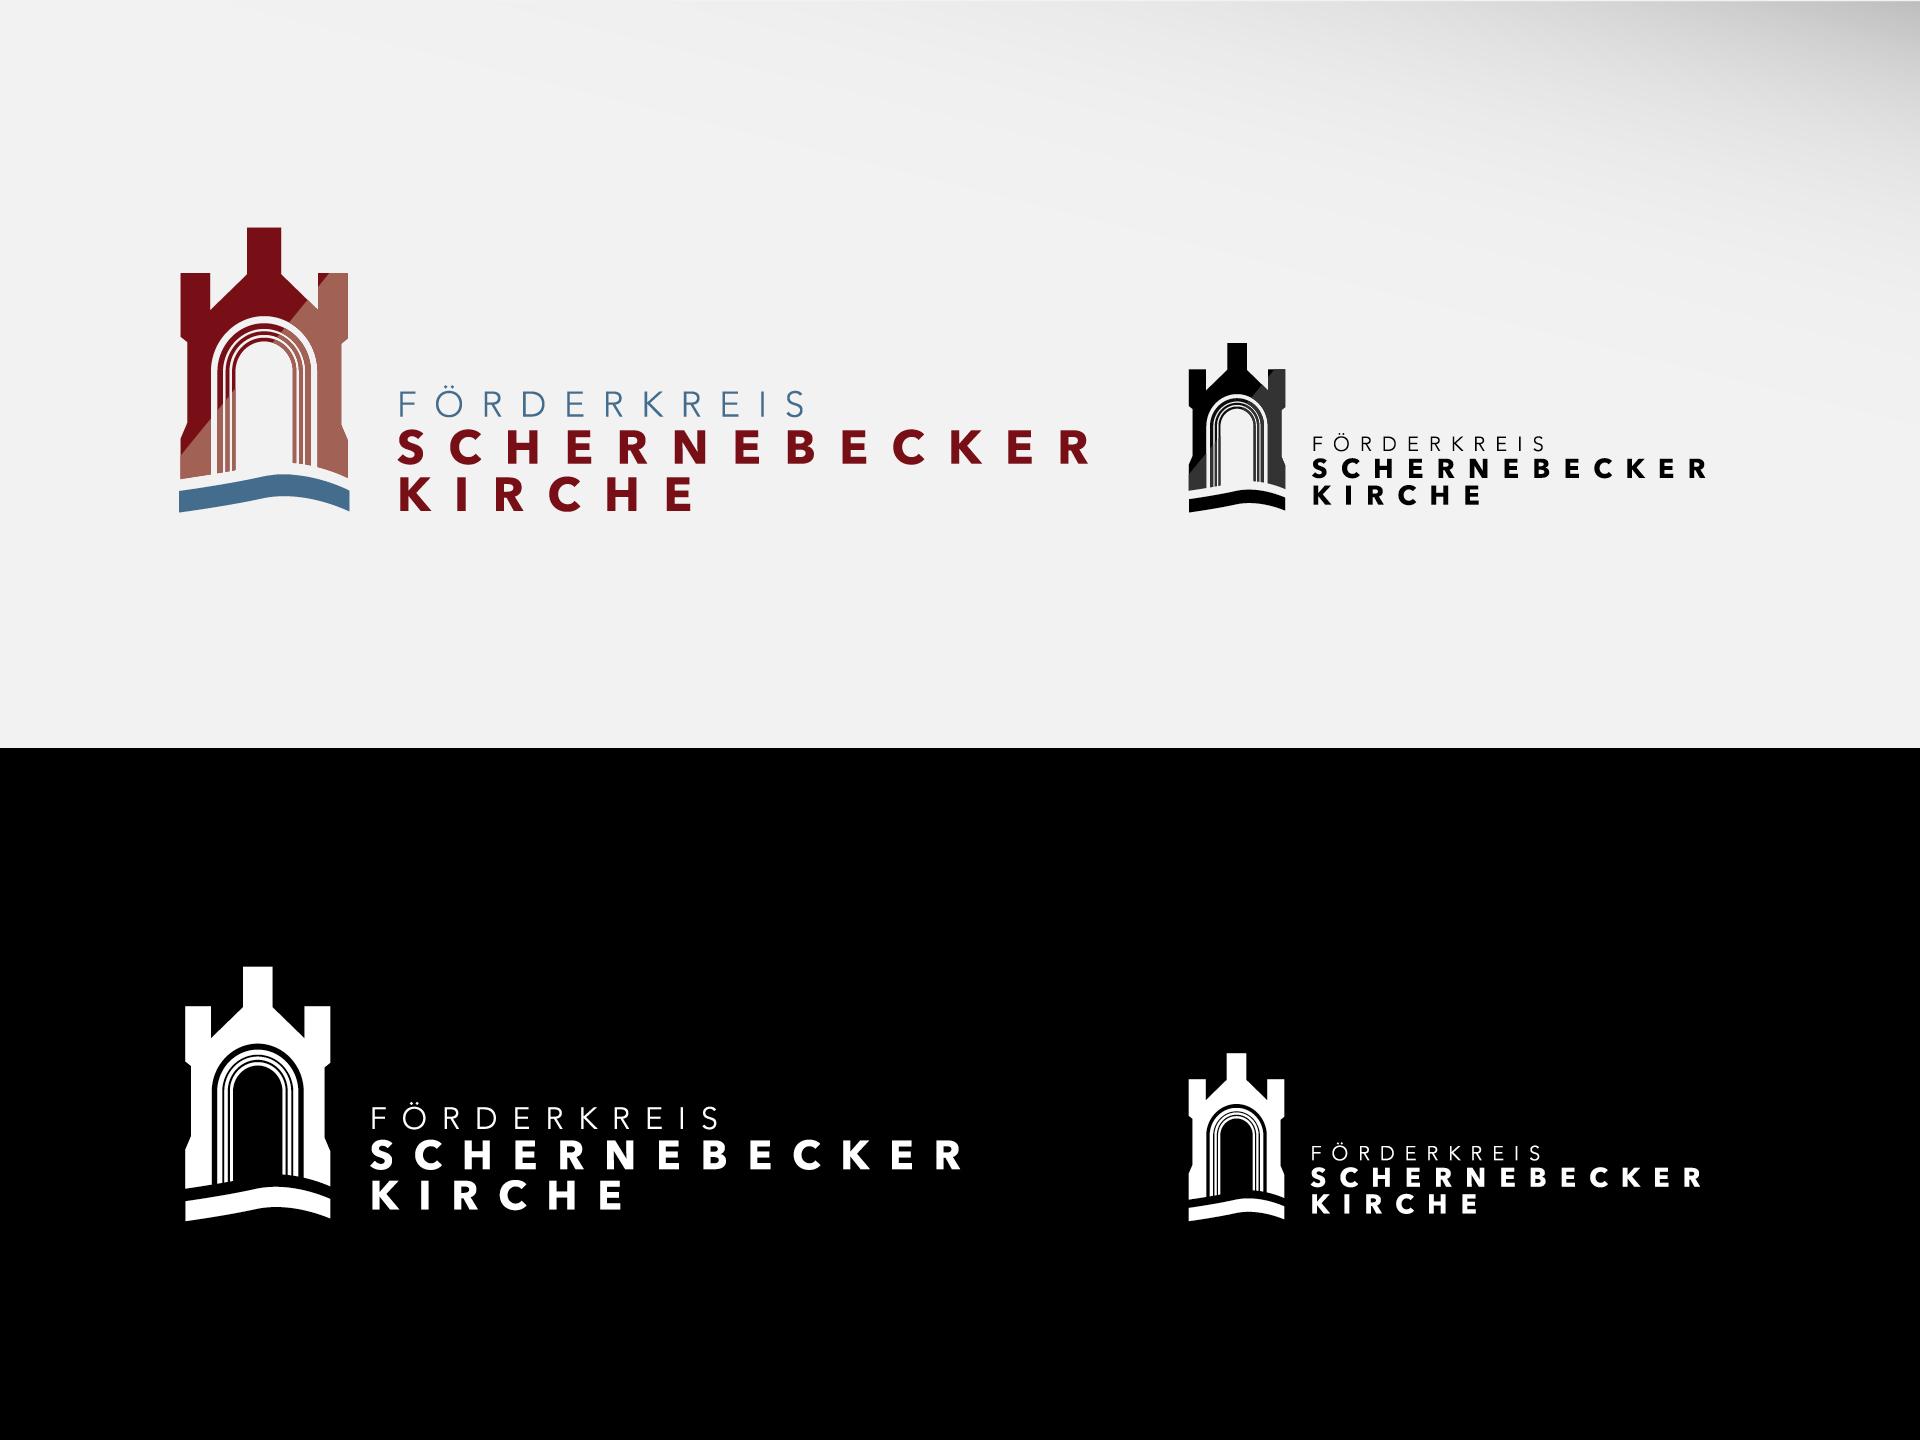 Förderkreis Schernebecker Kirche Corporate Design | Hoffmann und Partner